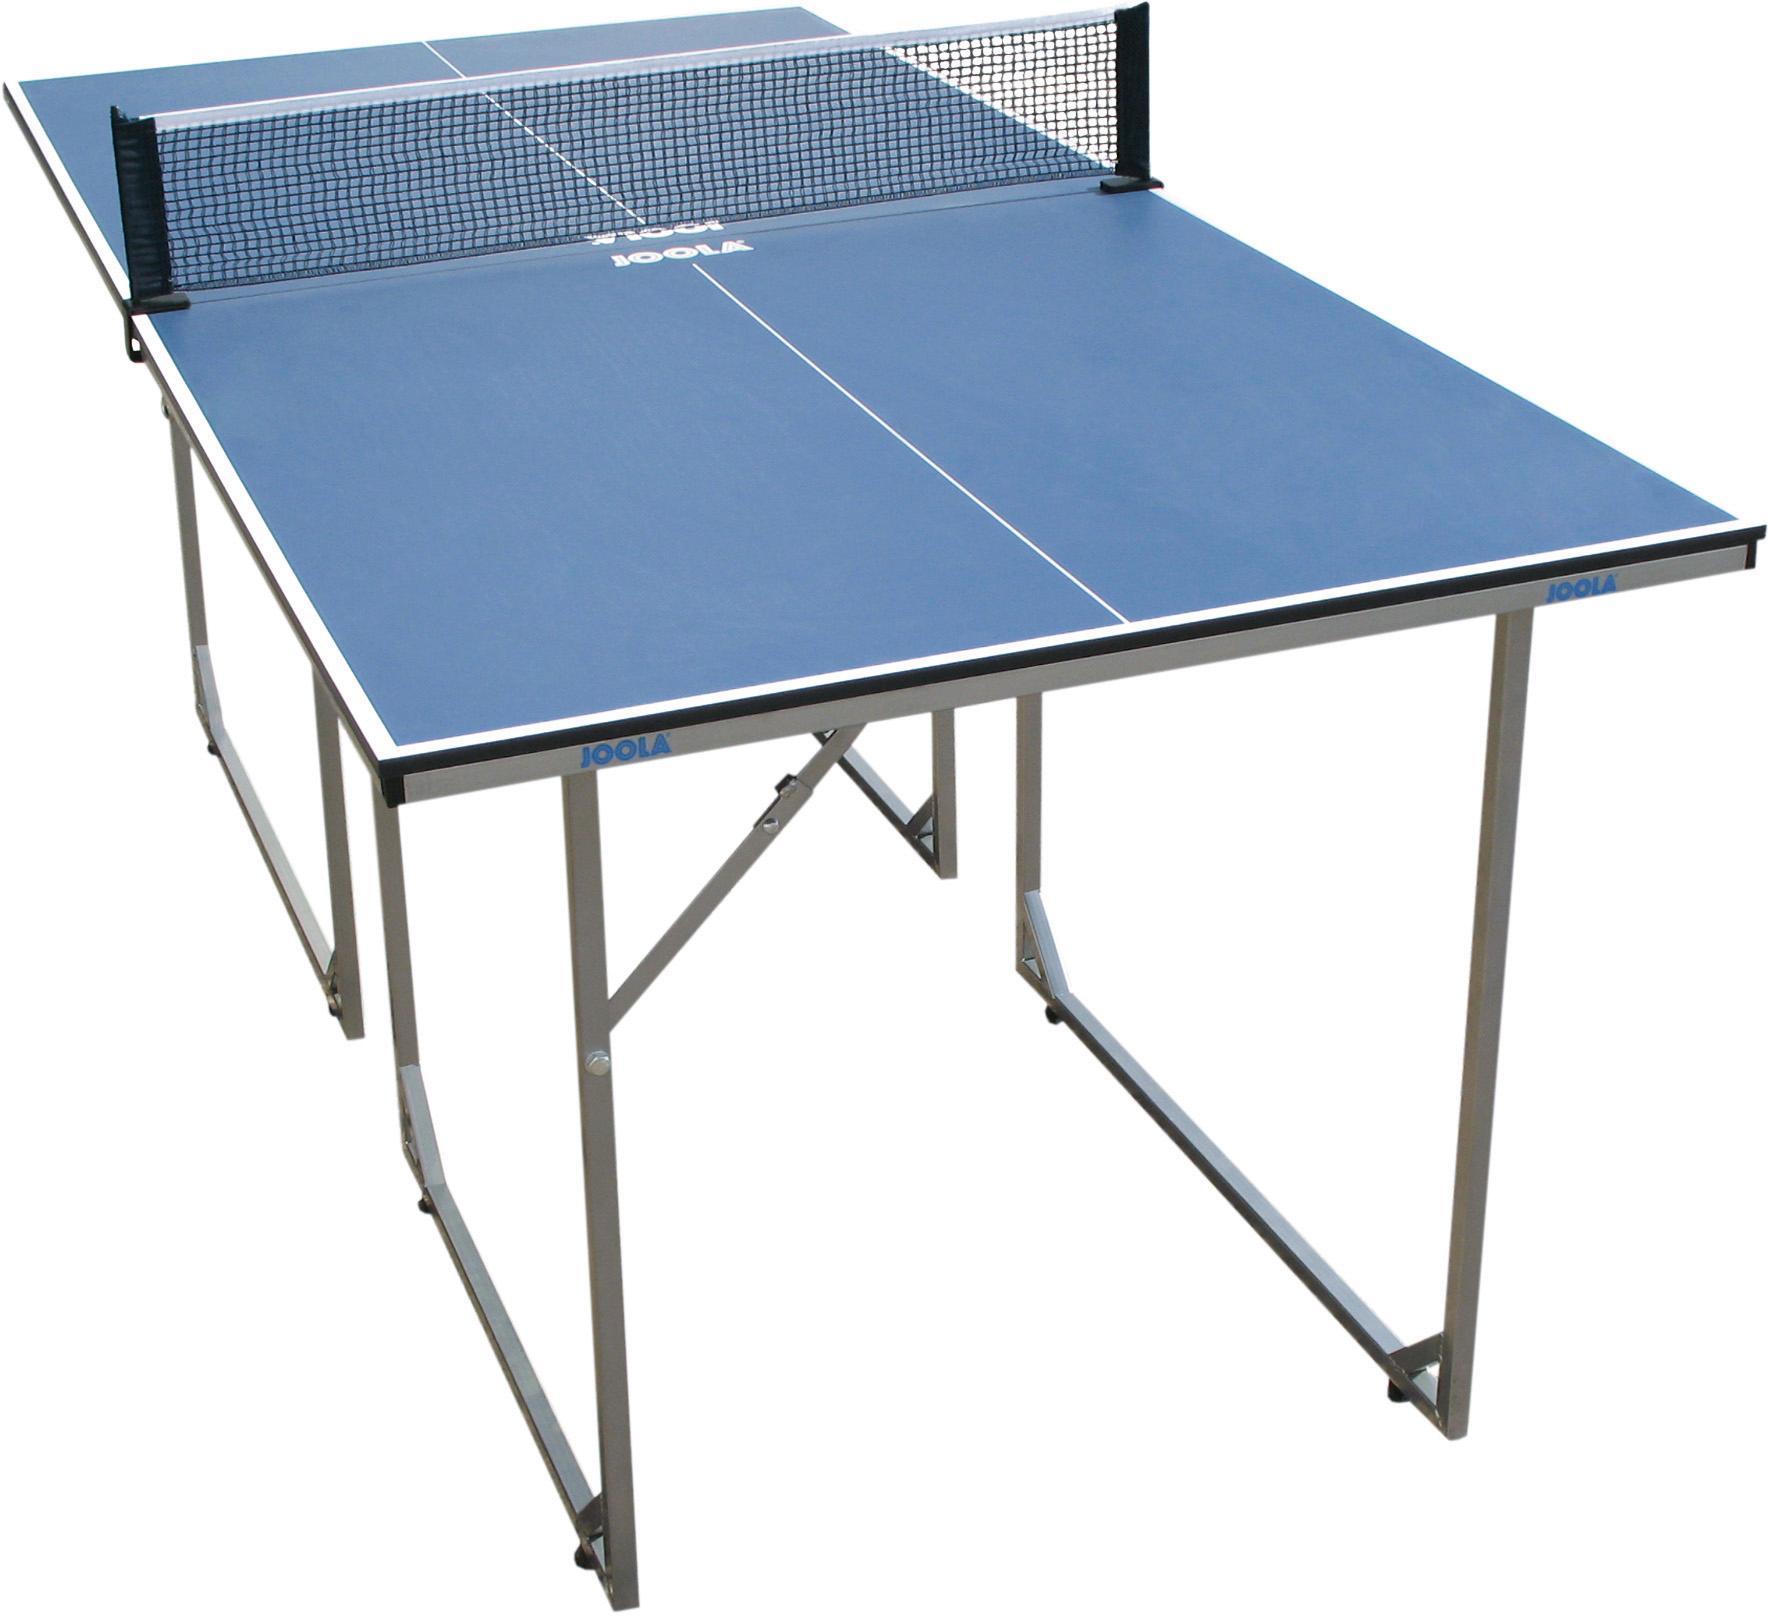 Joola Mini-Tischtennisplatte Midsize Technik & Freizeit/Sport & Freizeit/Sportarten/Tischtennis/Tischtennis-Ausrüstung